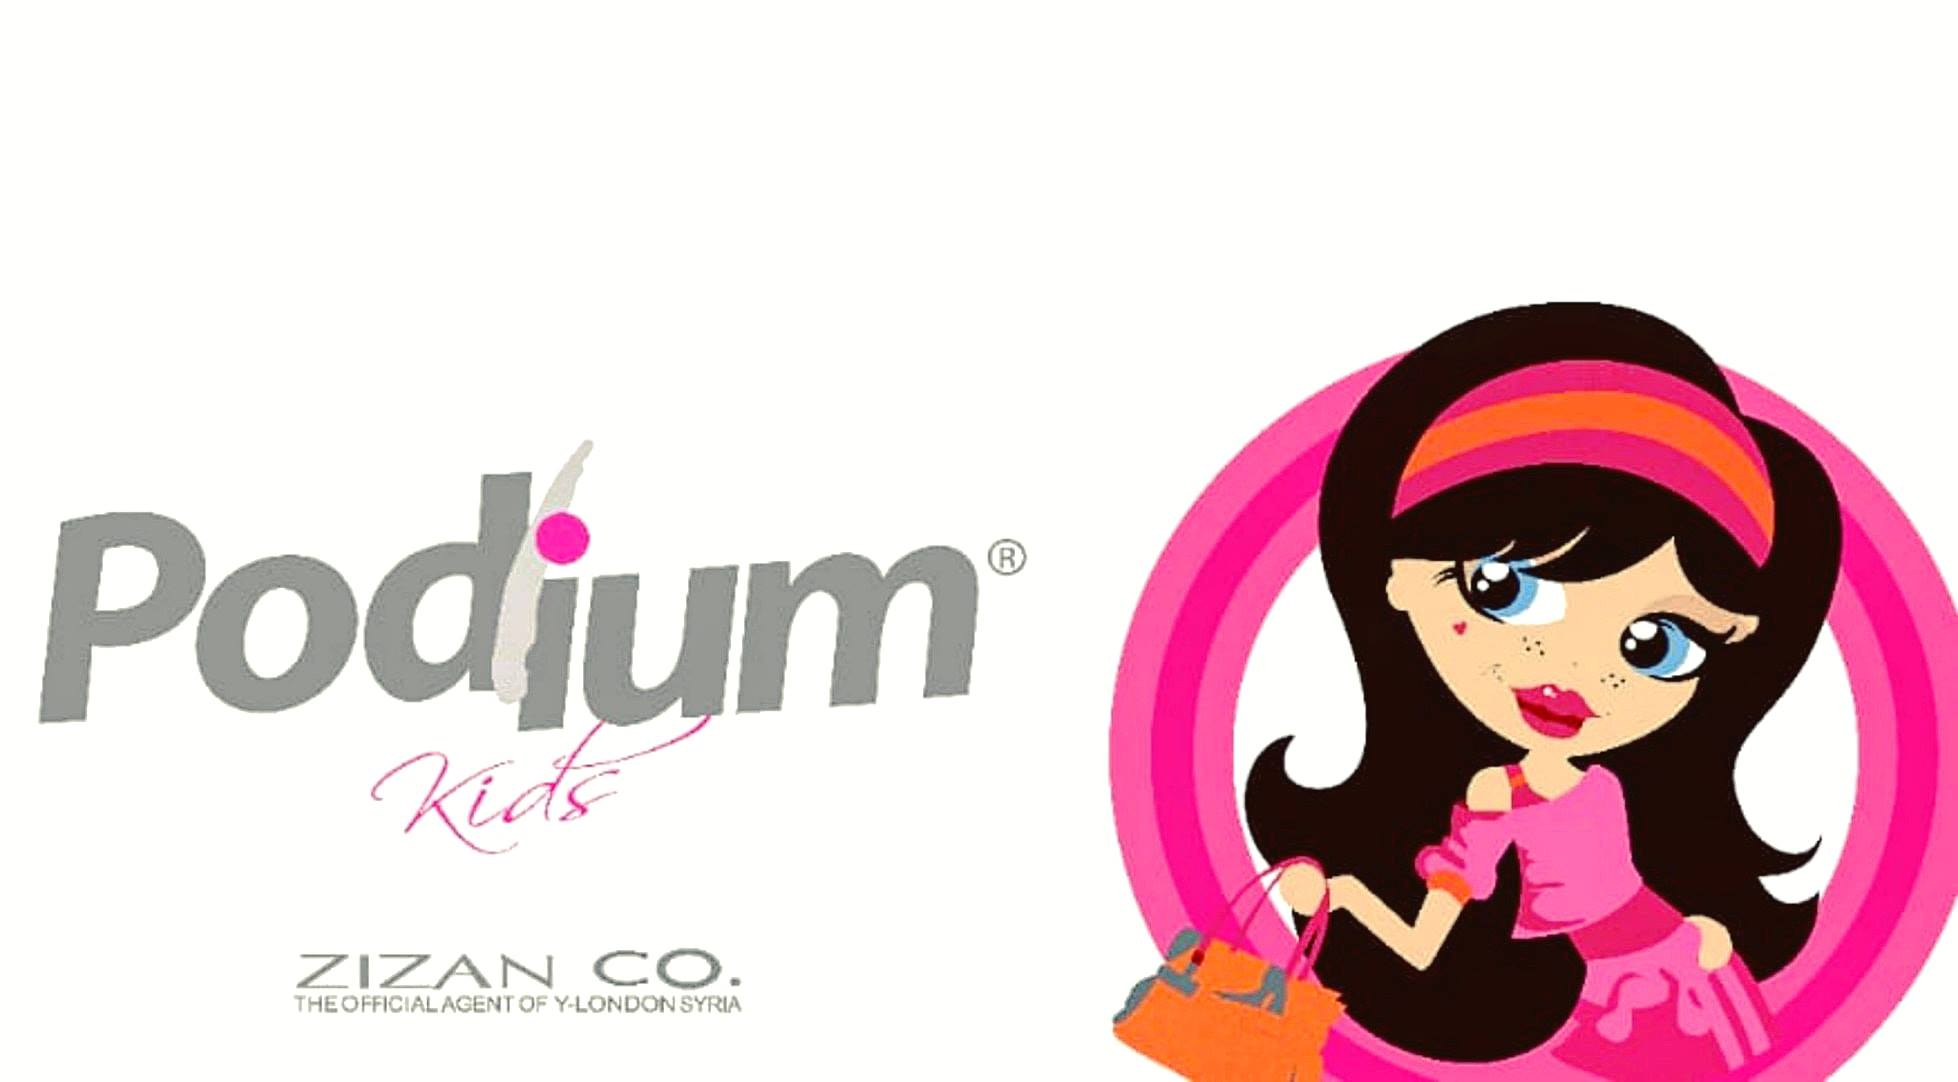 شركة بوديوم - Podium Company